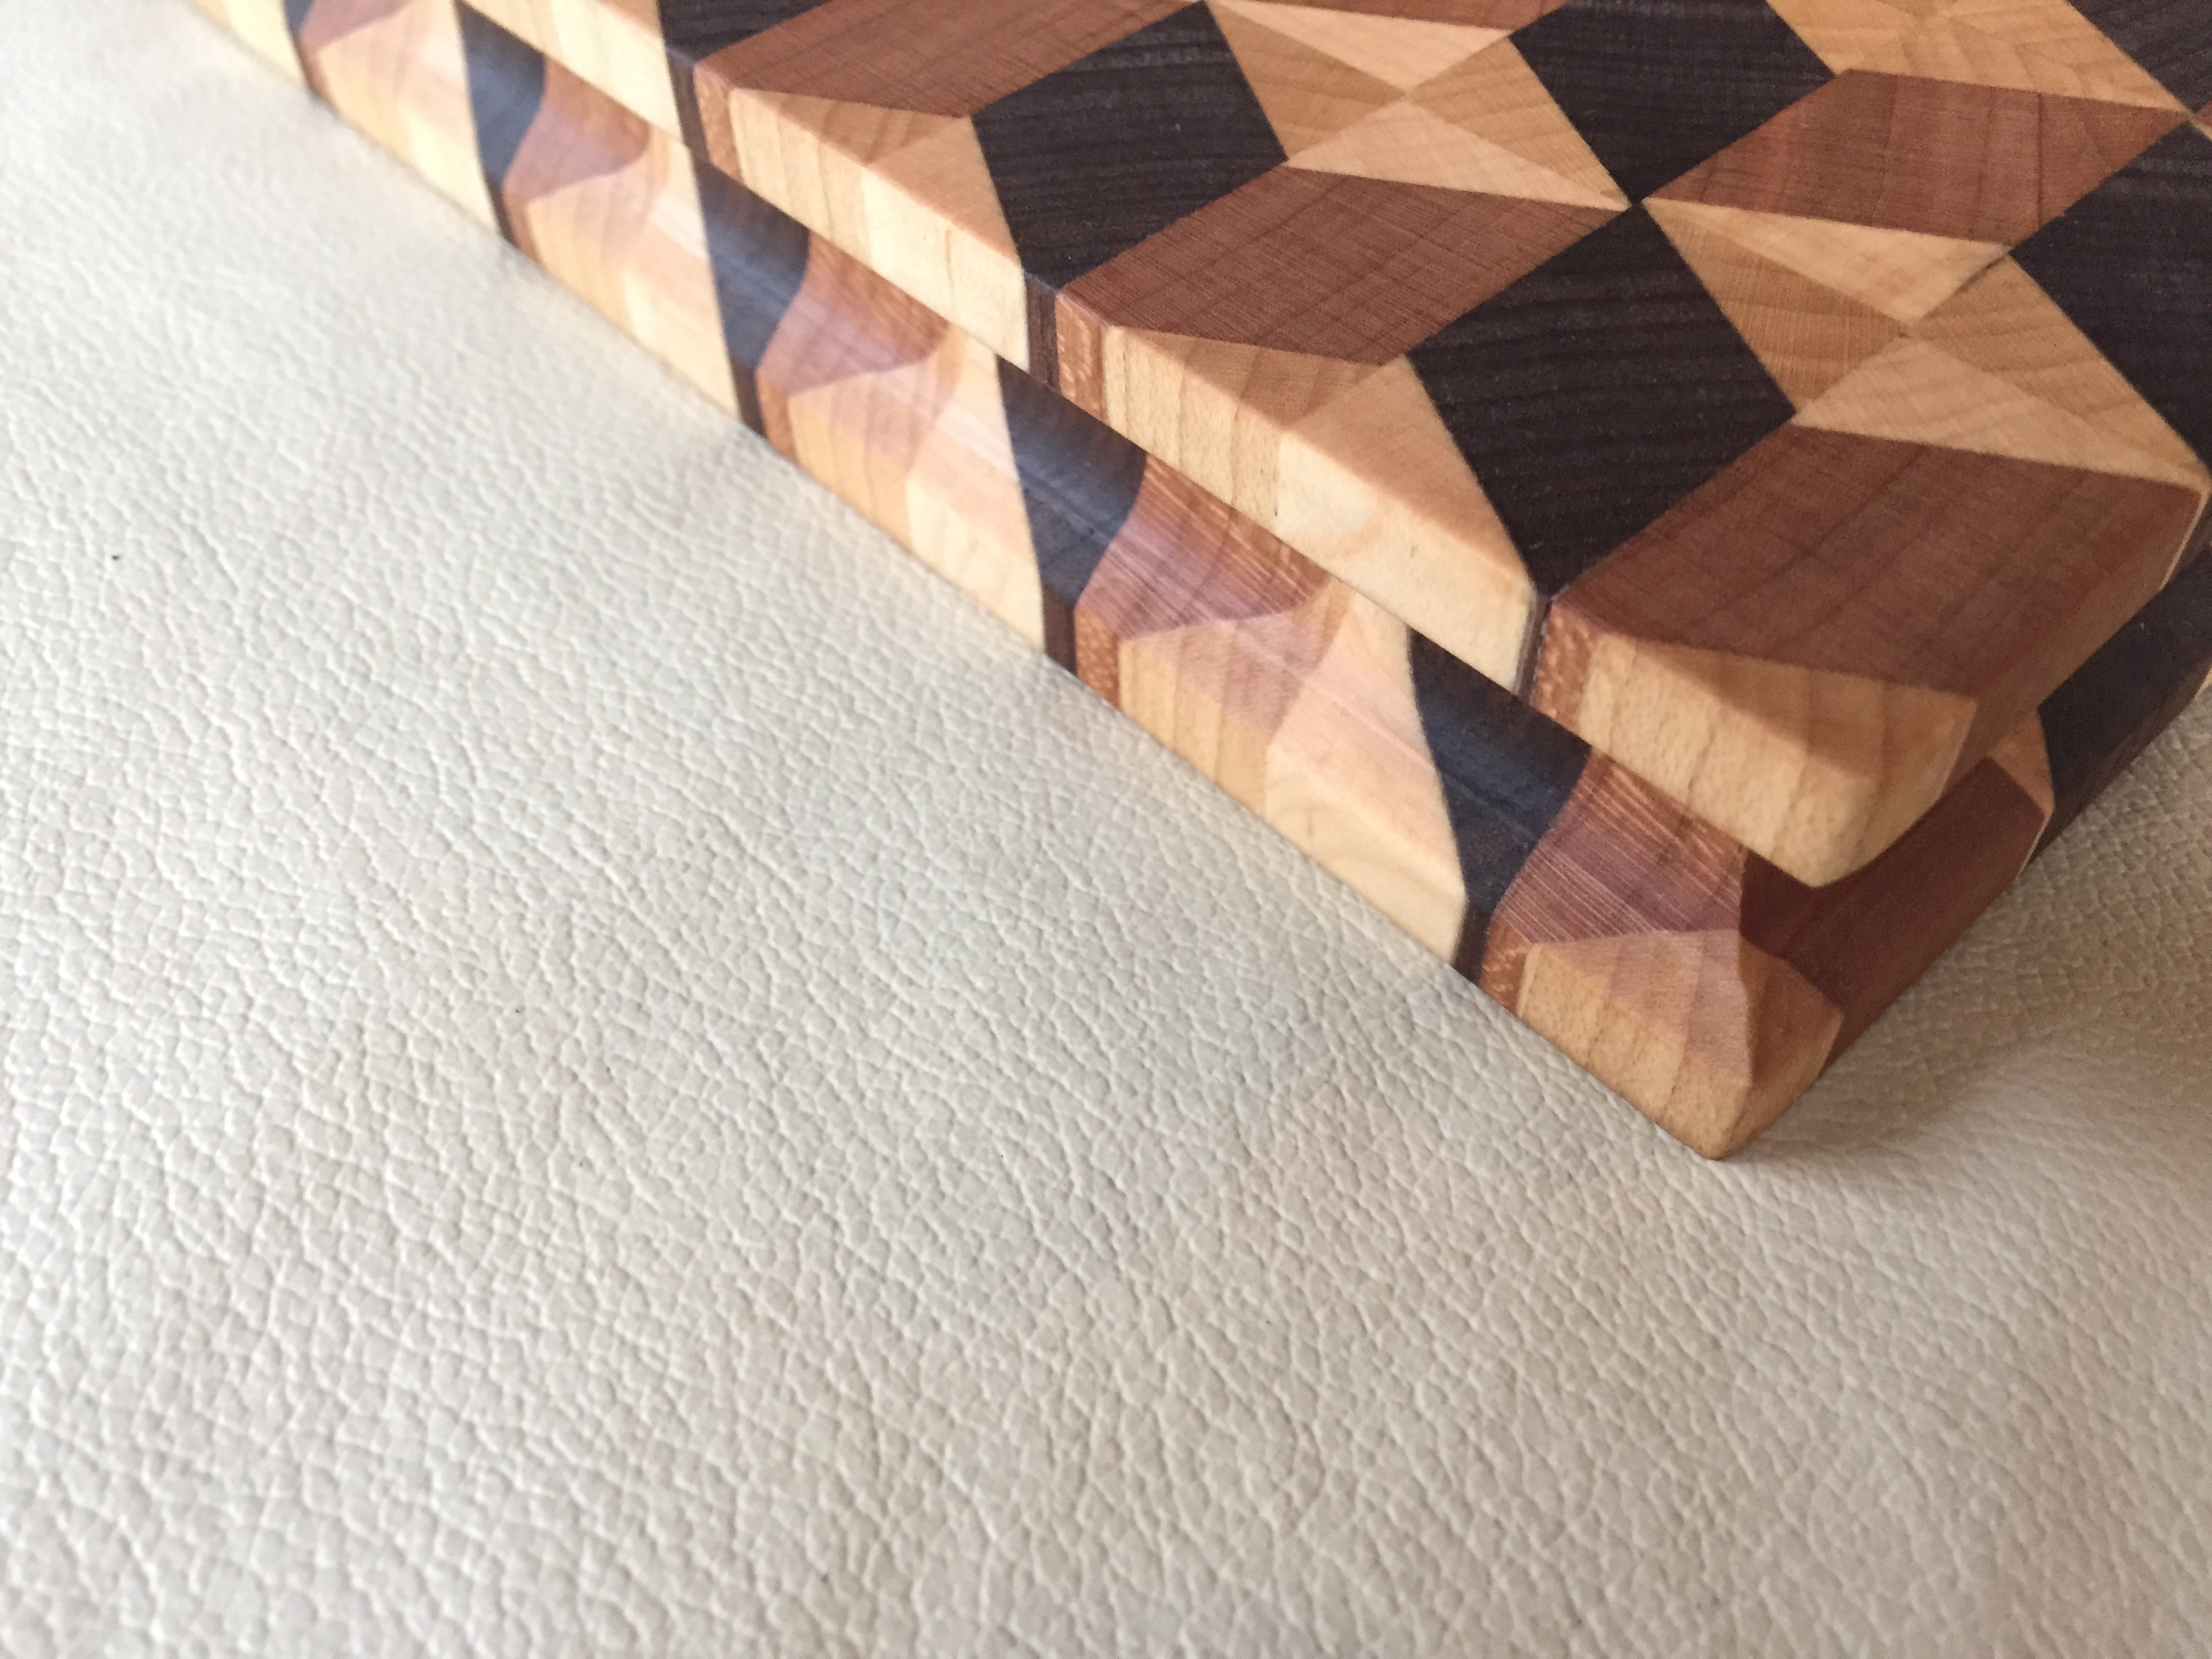 #17 Rectangular serving/cutting board 3D illusion